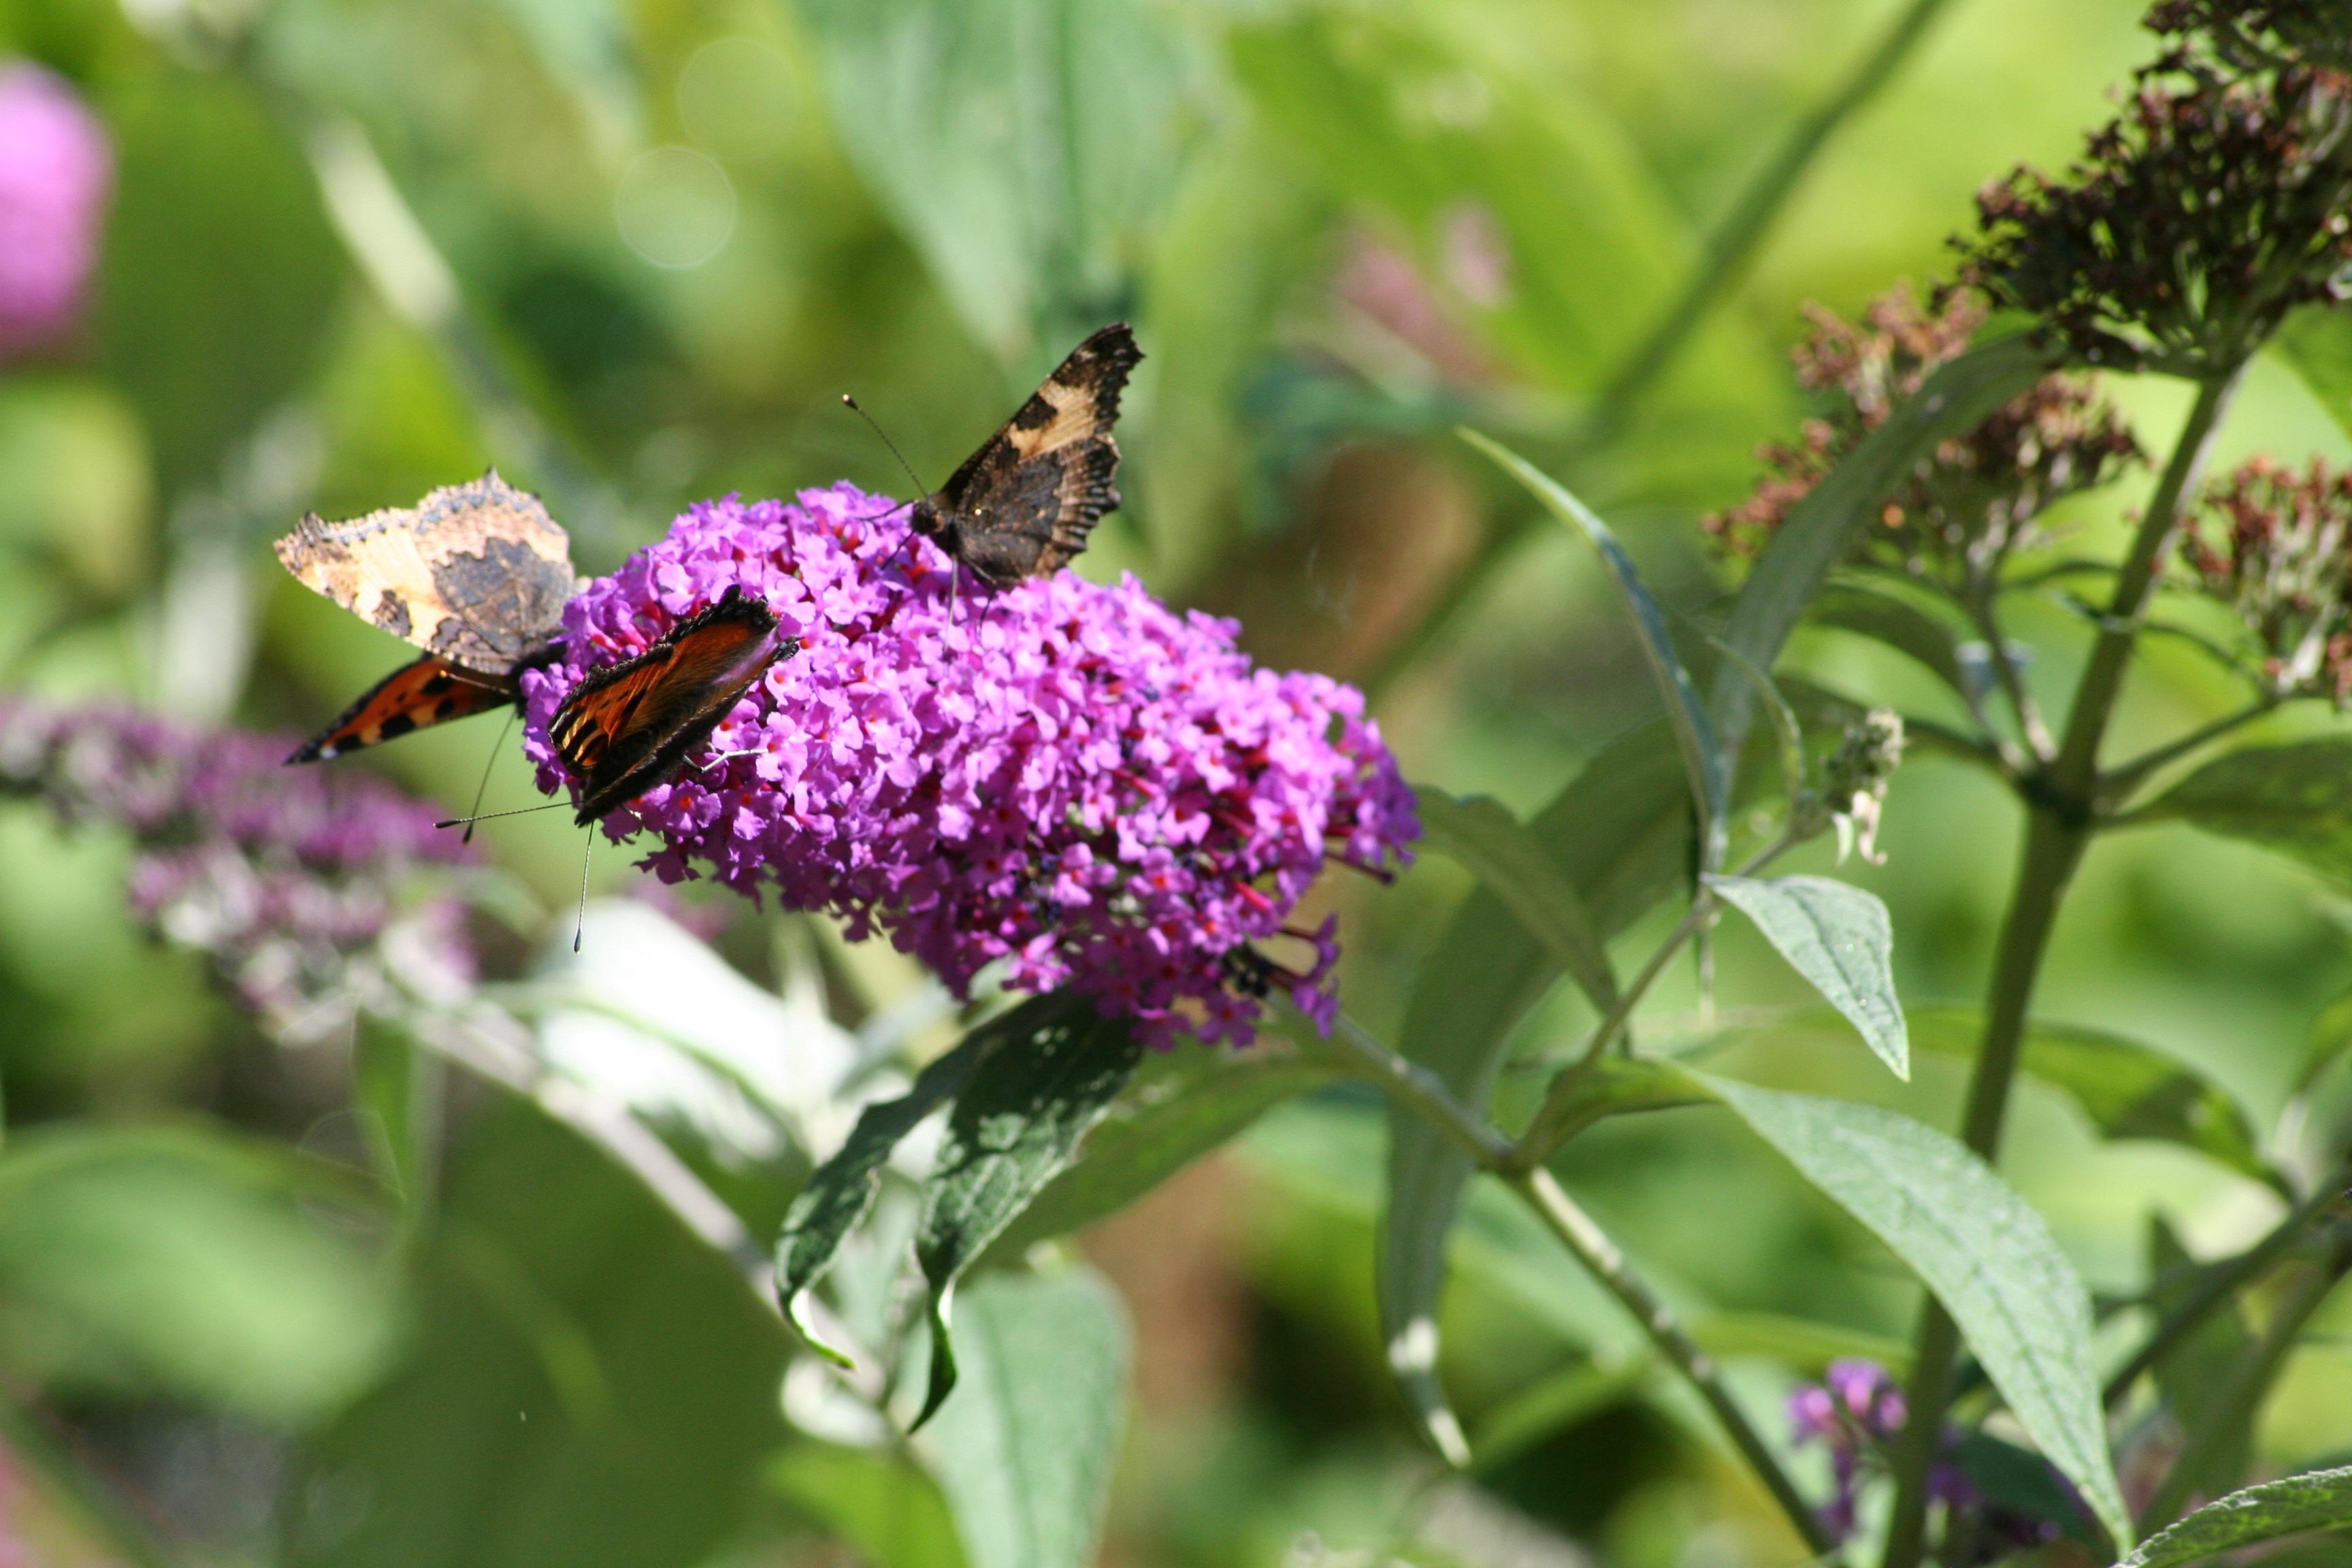 Nature Flower Wildlife Insect Hummingbird Botany Butterfly Garden Flora  Fauna Invertebrate Wildflower Shrub Bee Butterflies Nectar